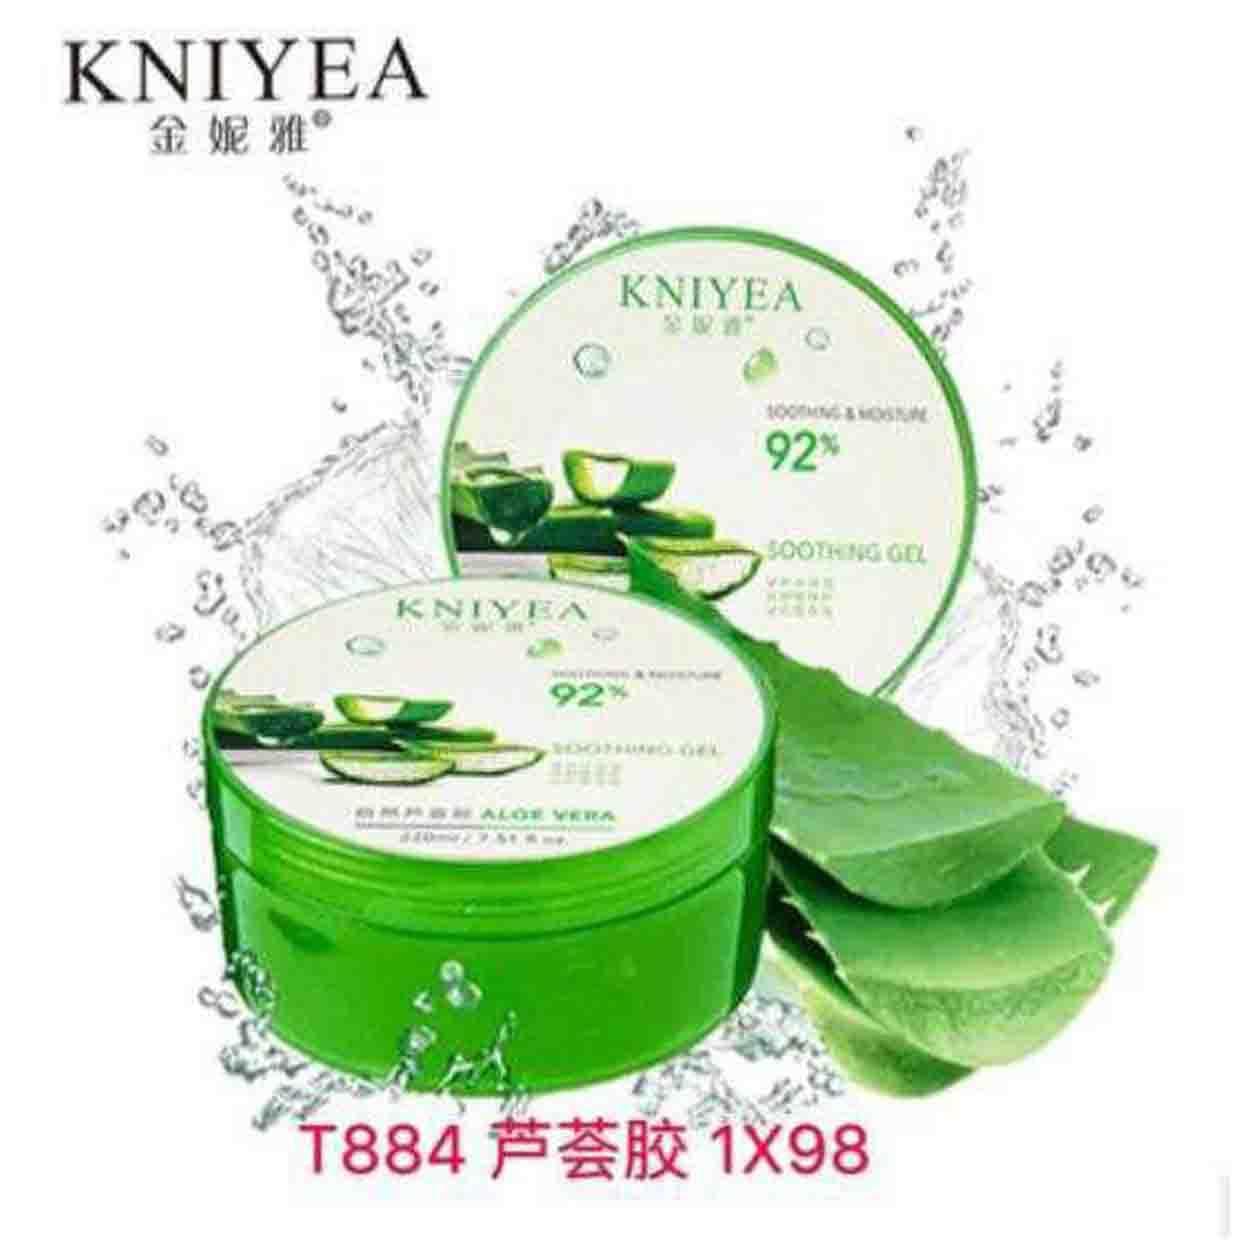 The Saem Jeju Fresh Soothing And Moisturizing Aloe Vera Gel 300ml 92